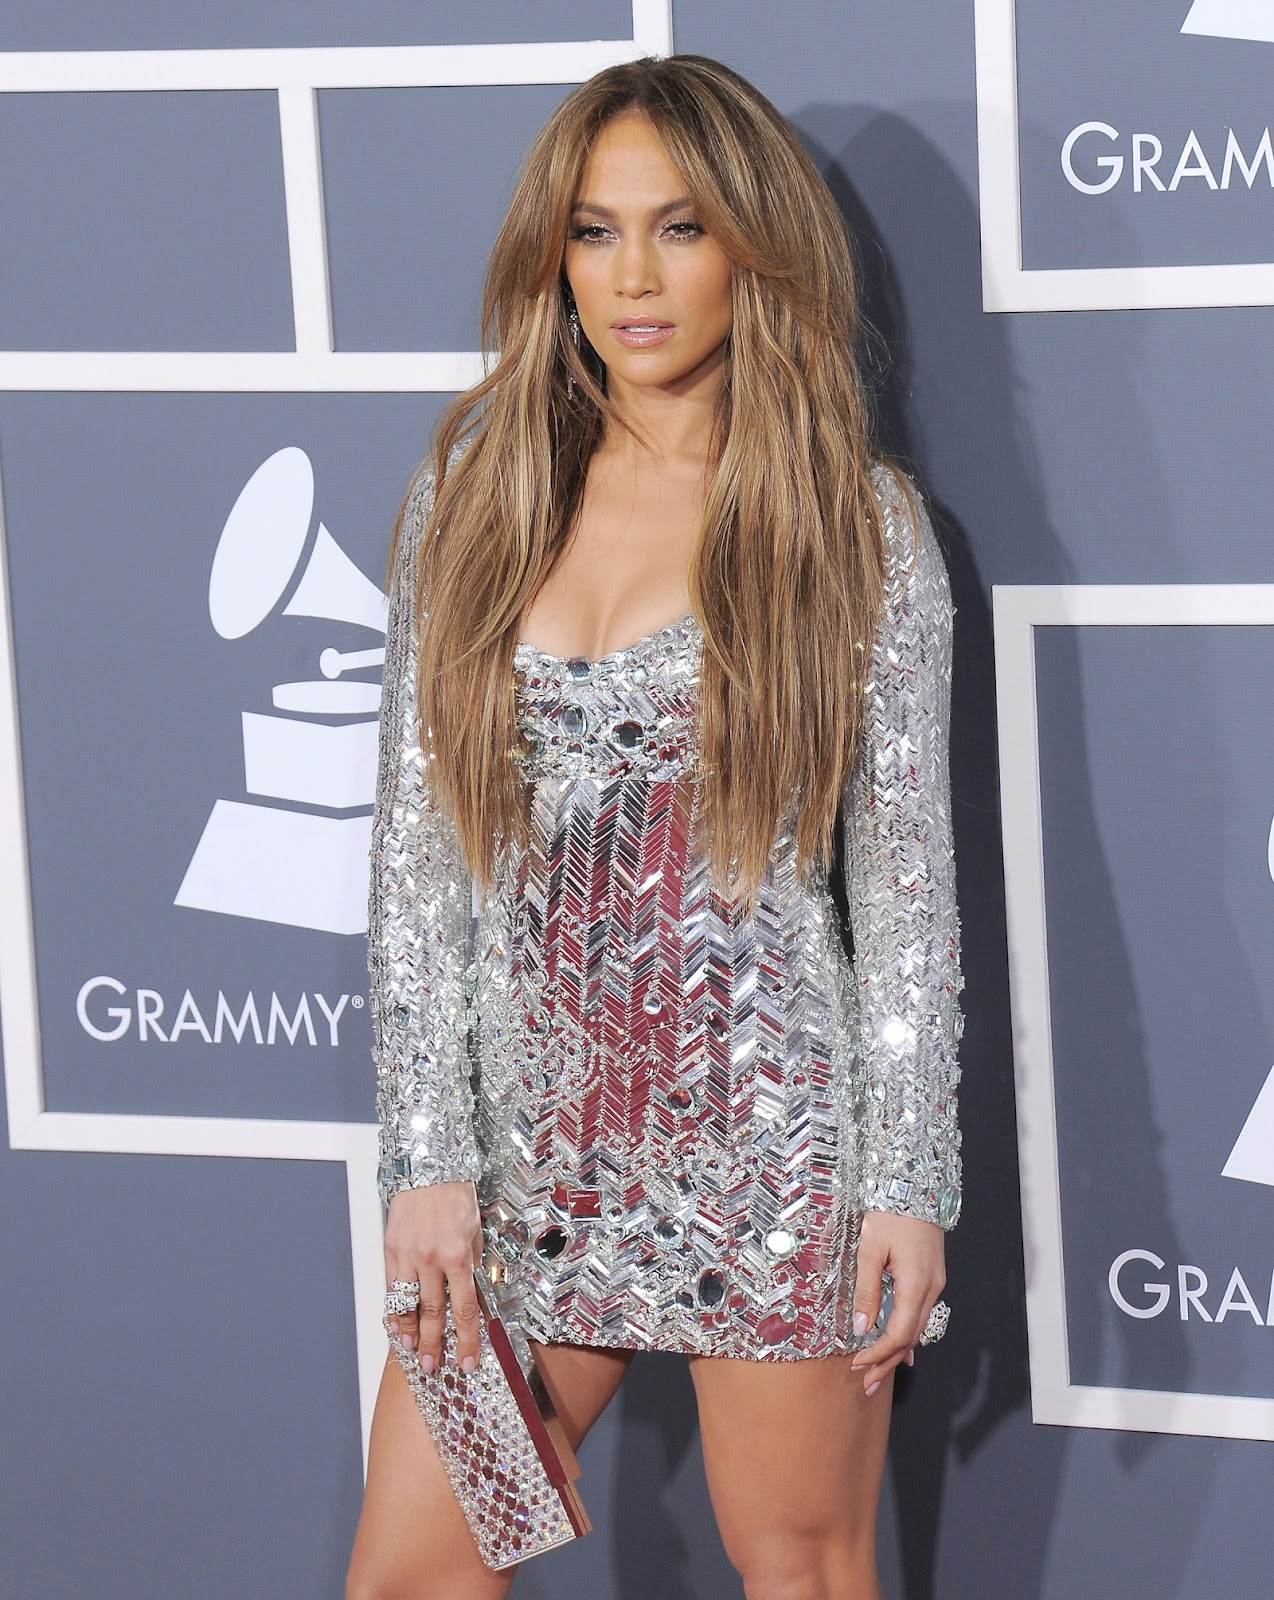 http://3.bp.blogspot.com/-du2dXofGoJM/UC8CX-Xz37I/AAAAAAAADyc/Qiajo6qGc-E/s1600/Jennifer+Lopez+Grammy.jpg